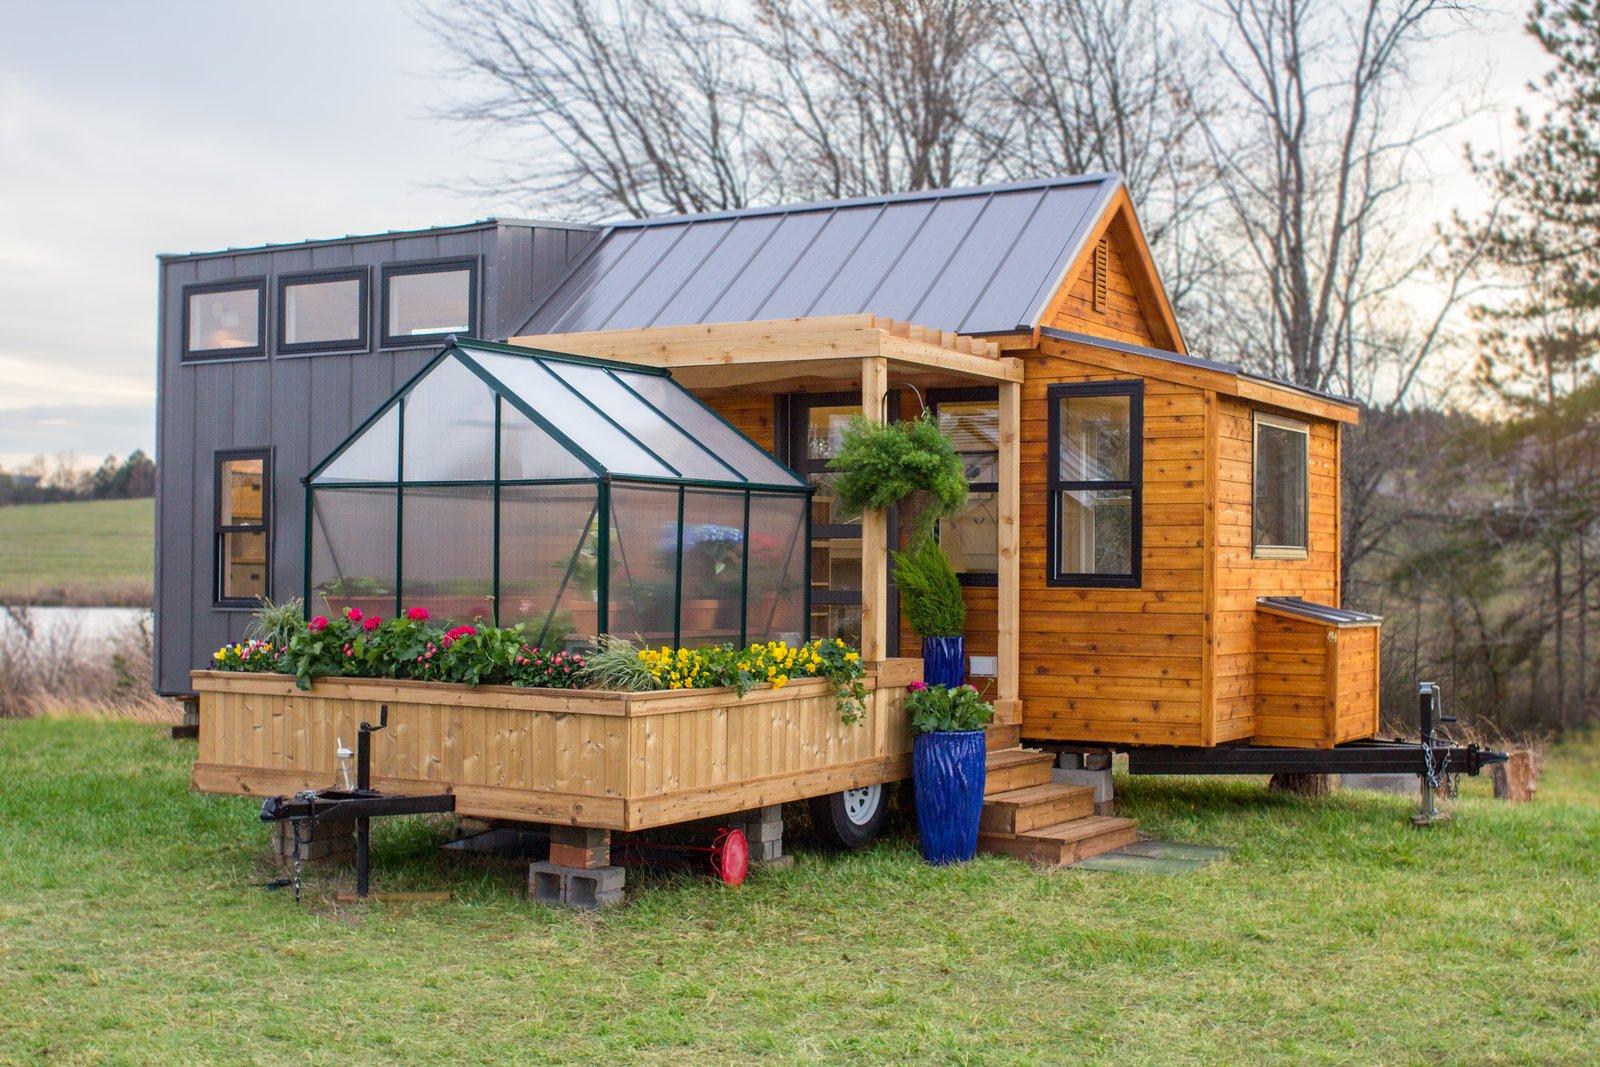 The Elsa Karya Olive Nest Tiny Homes